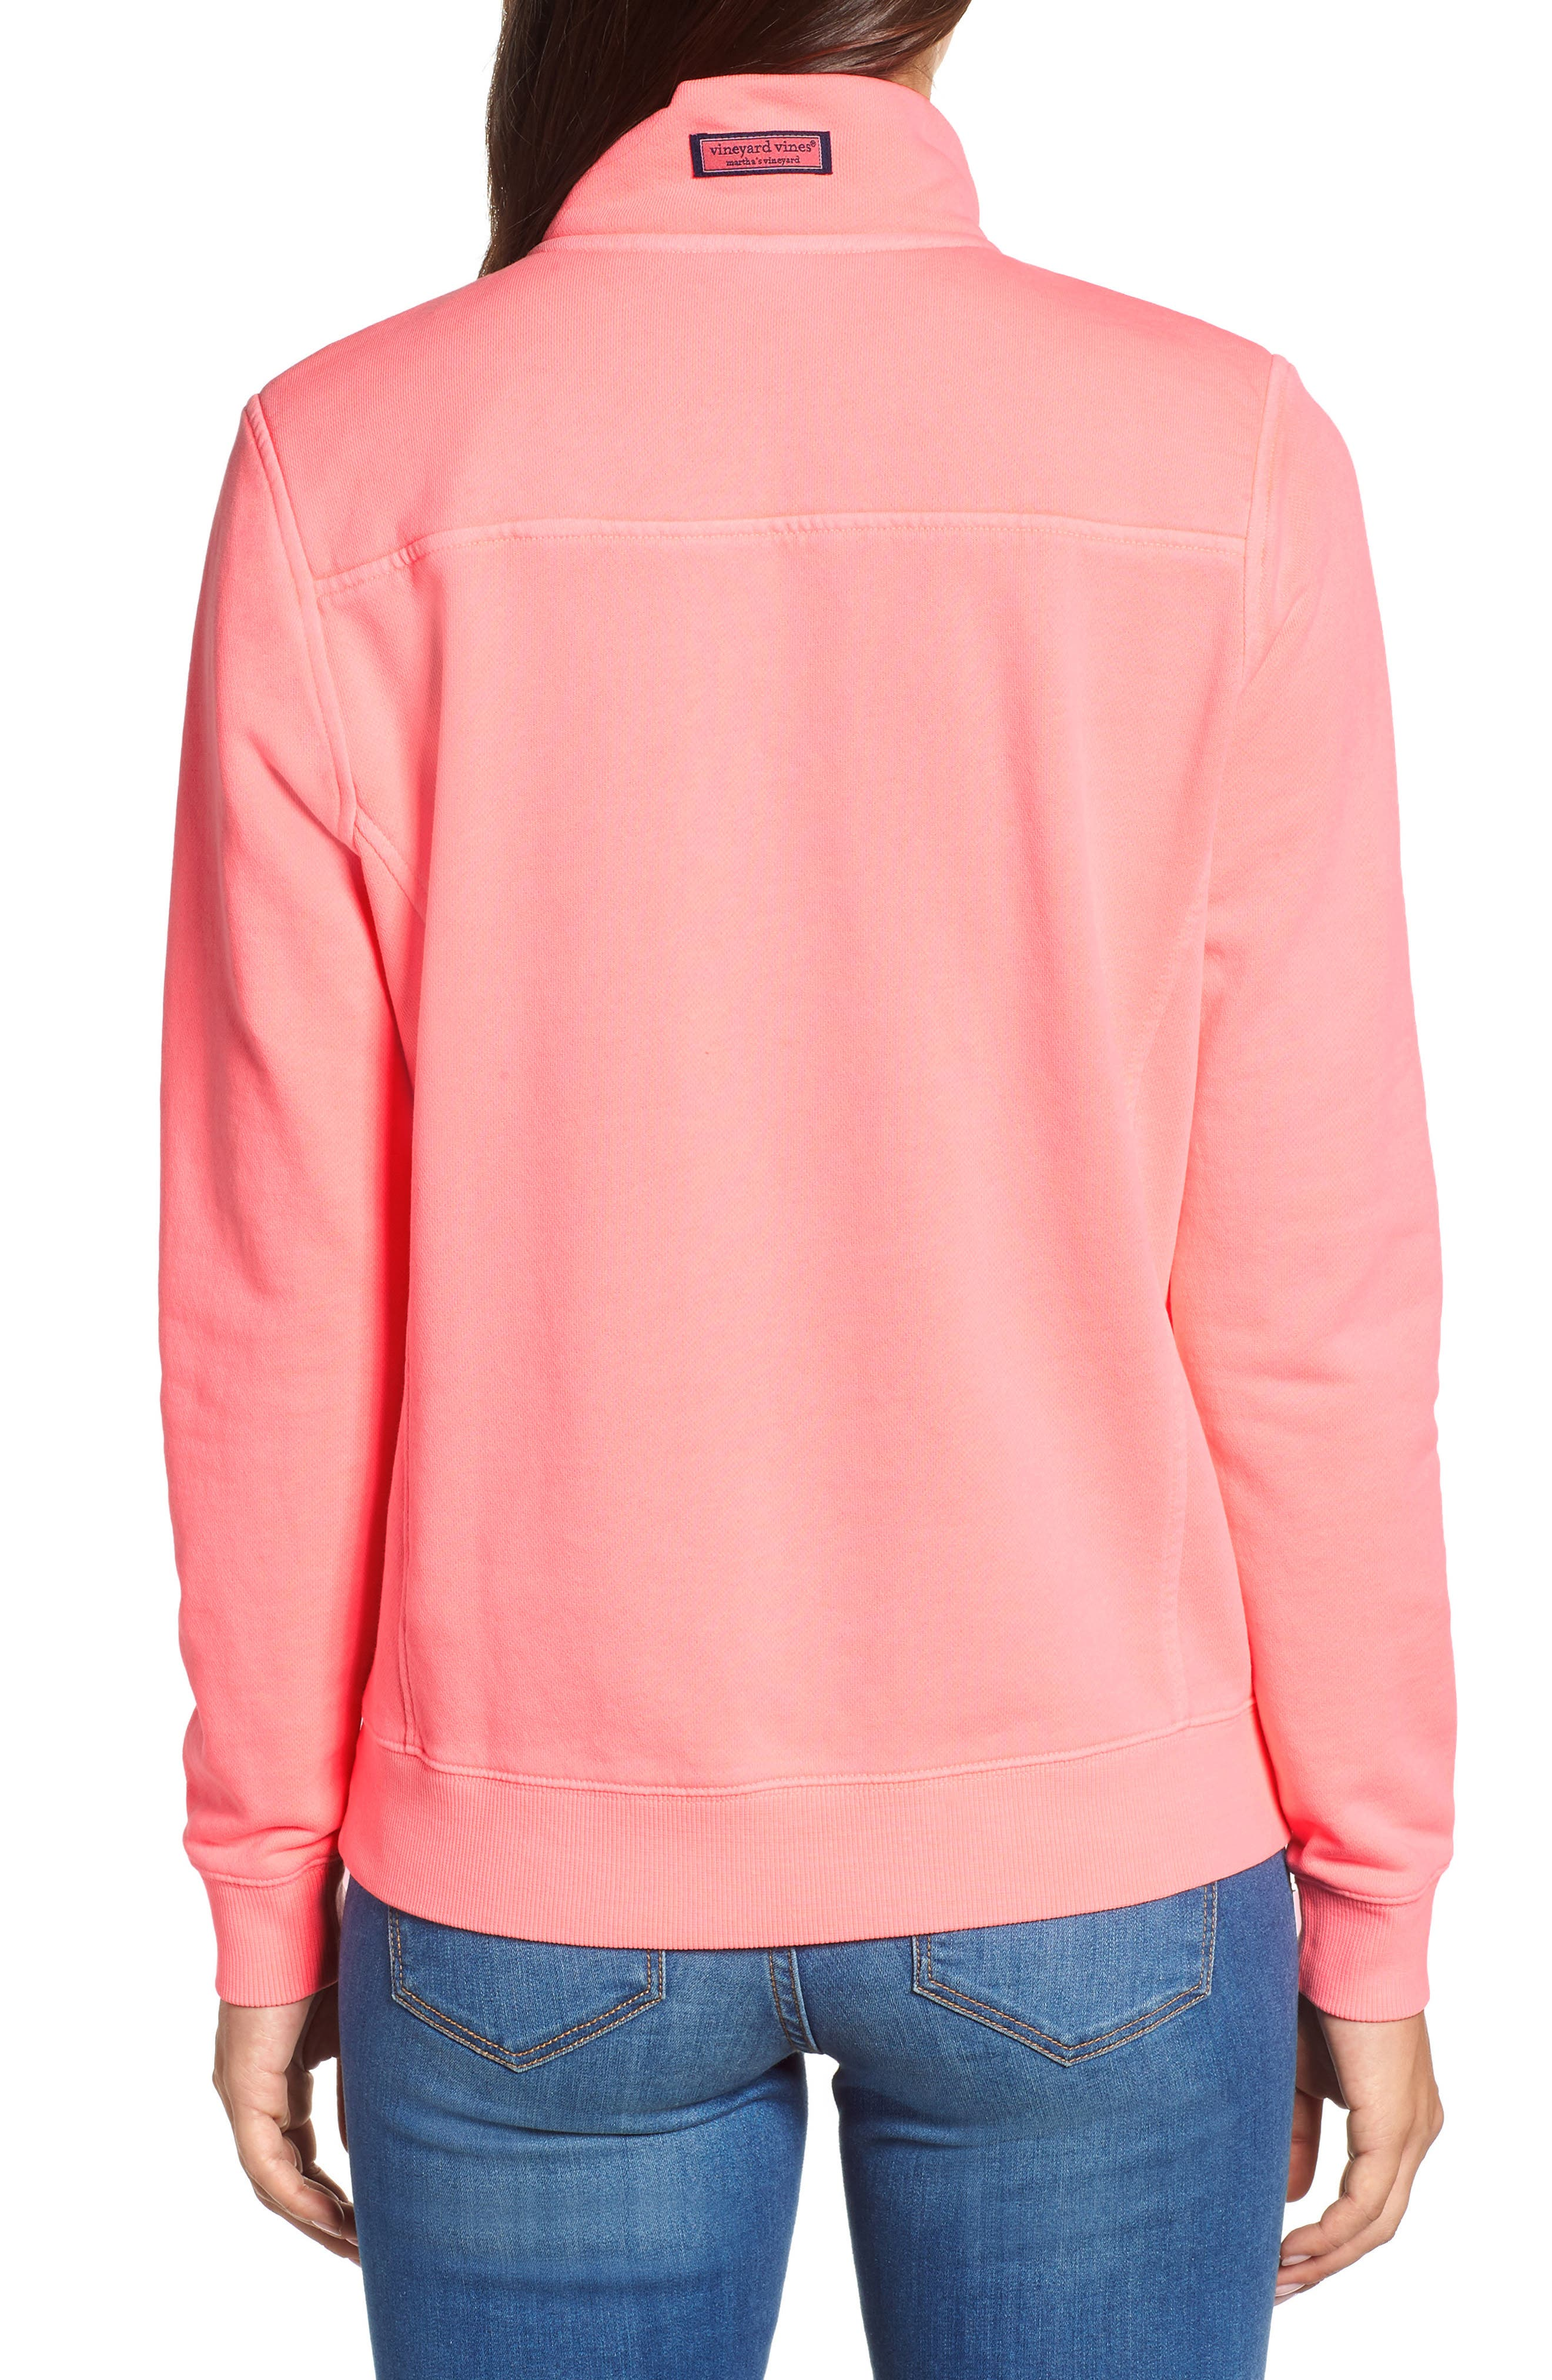 VINEYARD VINES,                             Garment Dyed Classic Shep Pullover,                             Alternate thumbnail 2, color,                             655